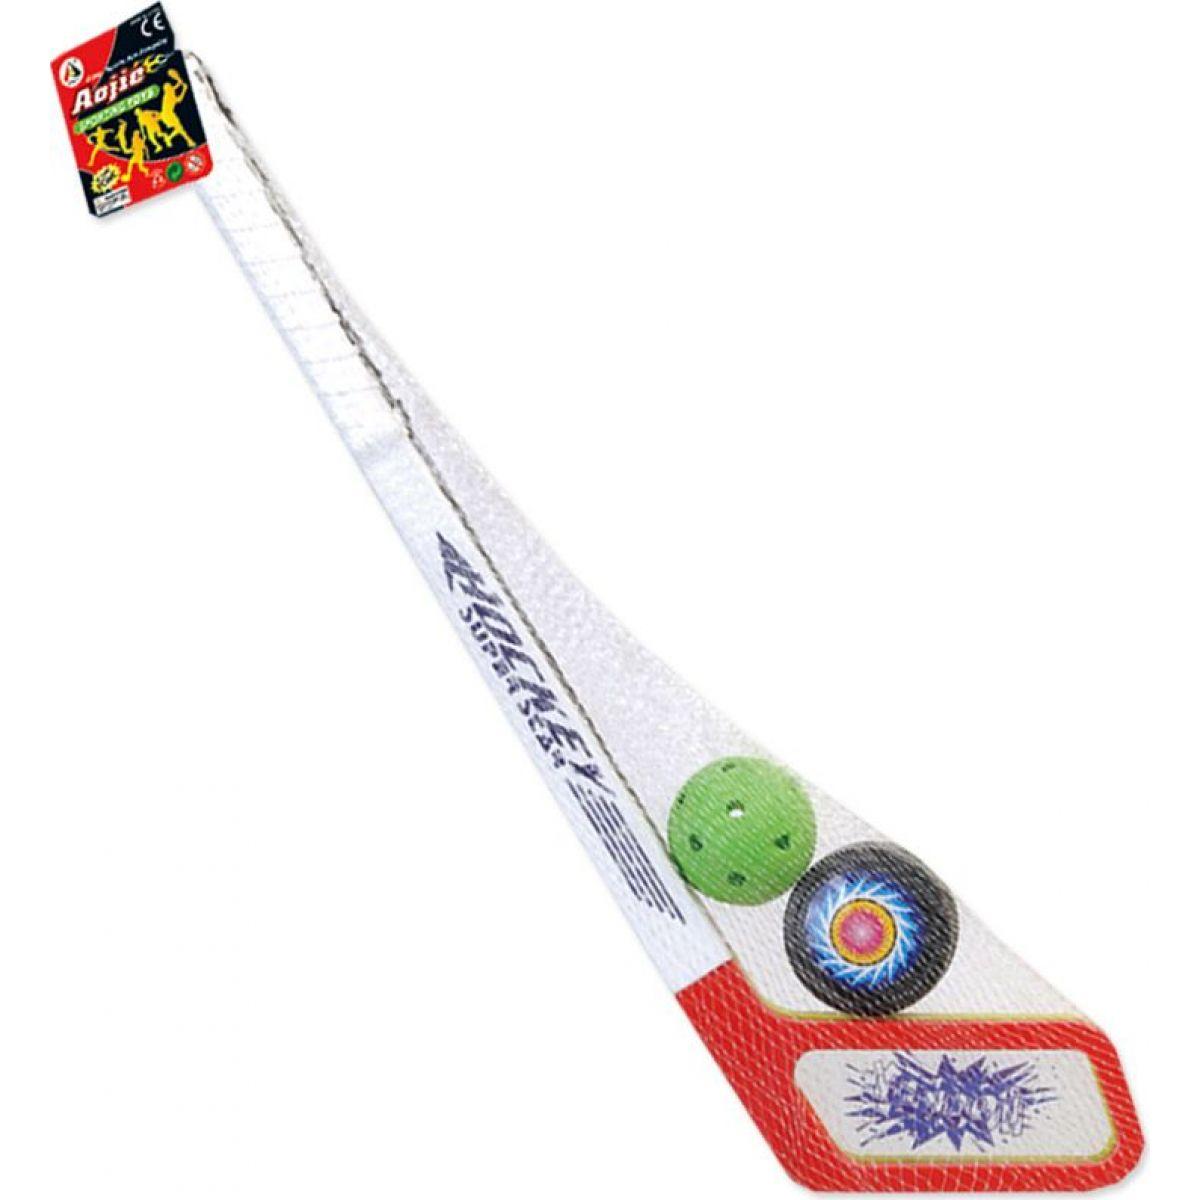 HM Studio Hokejky s pukom a florbalovou loptičkou 55 cm